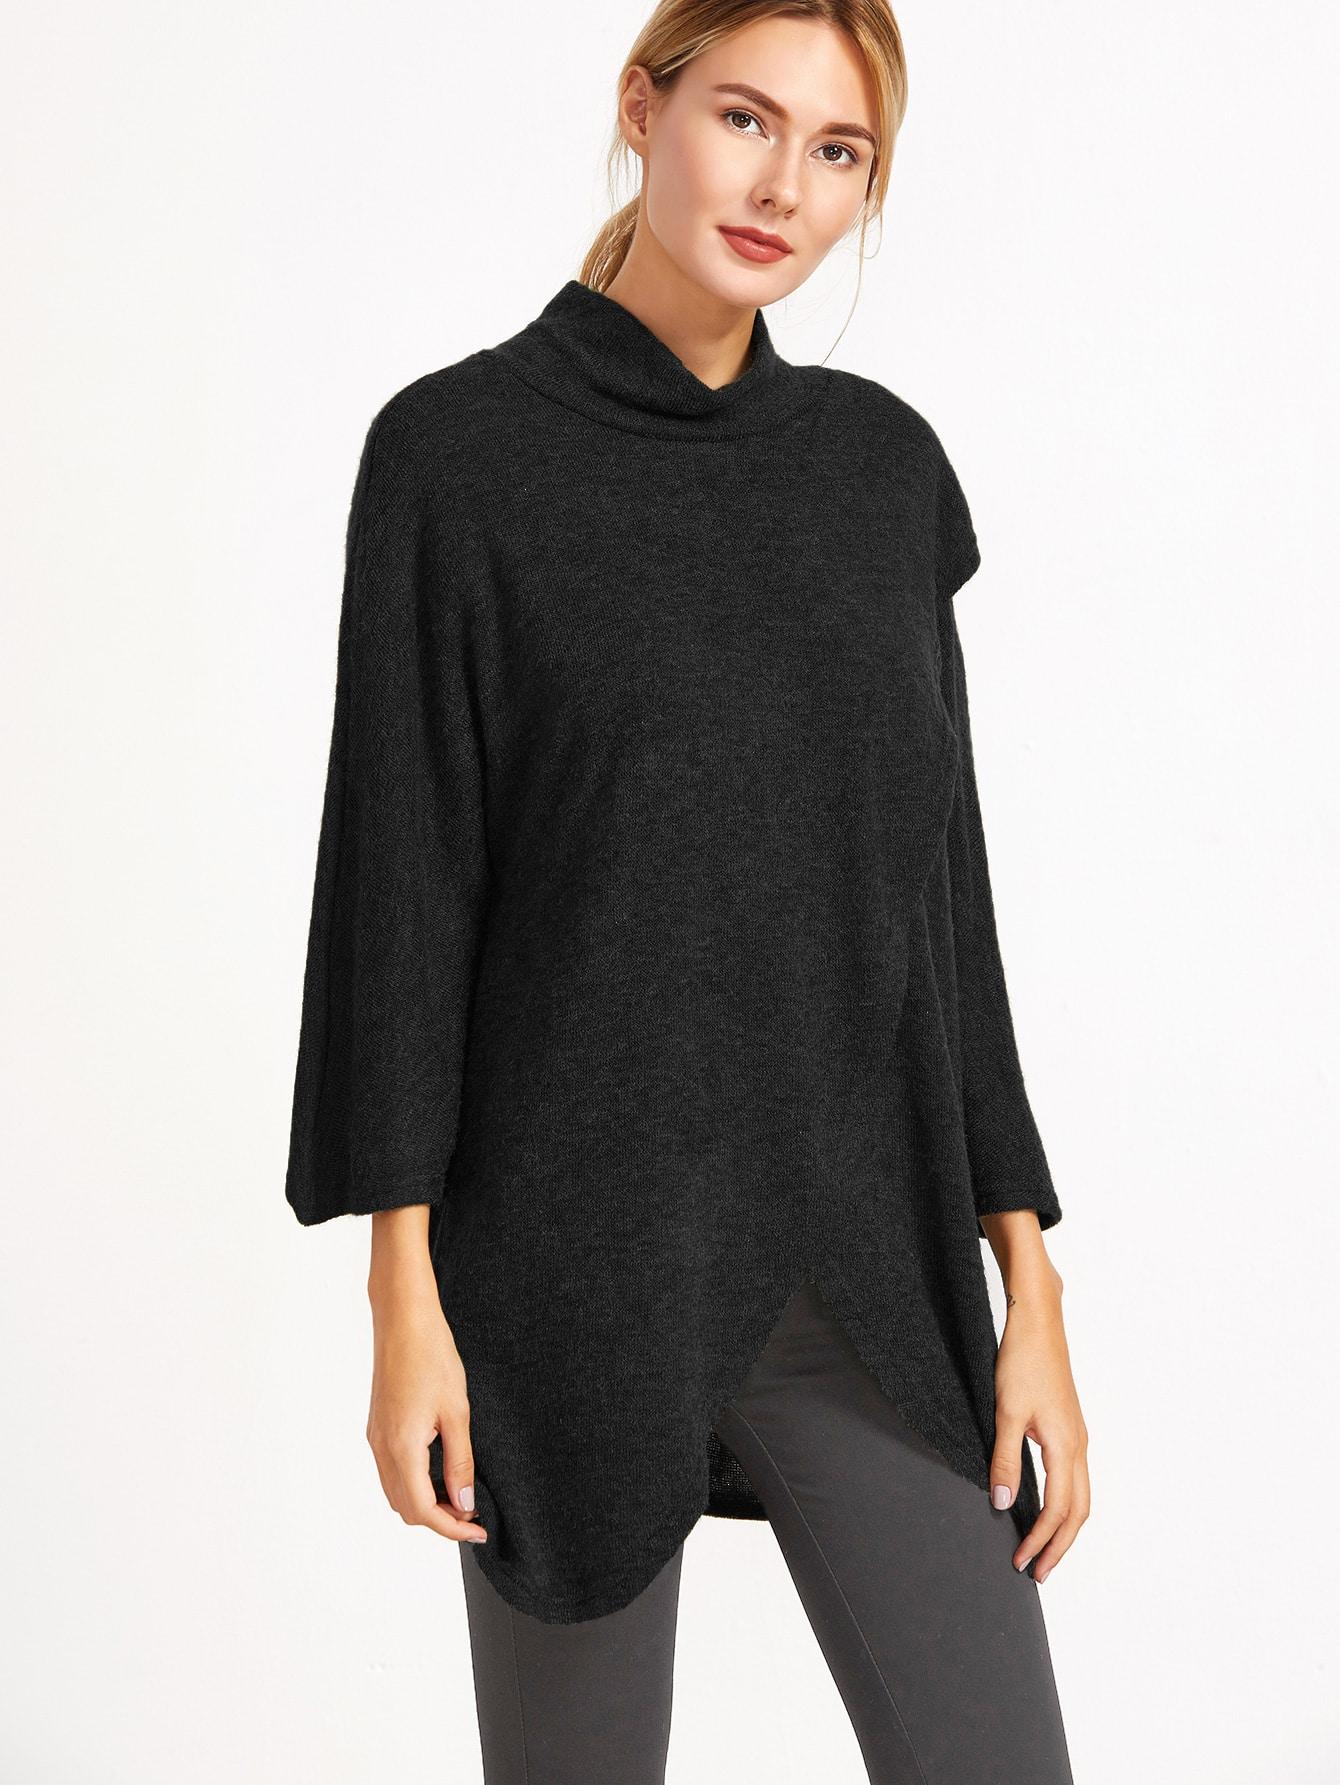 sweater161221301_2